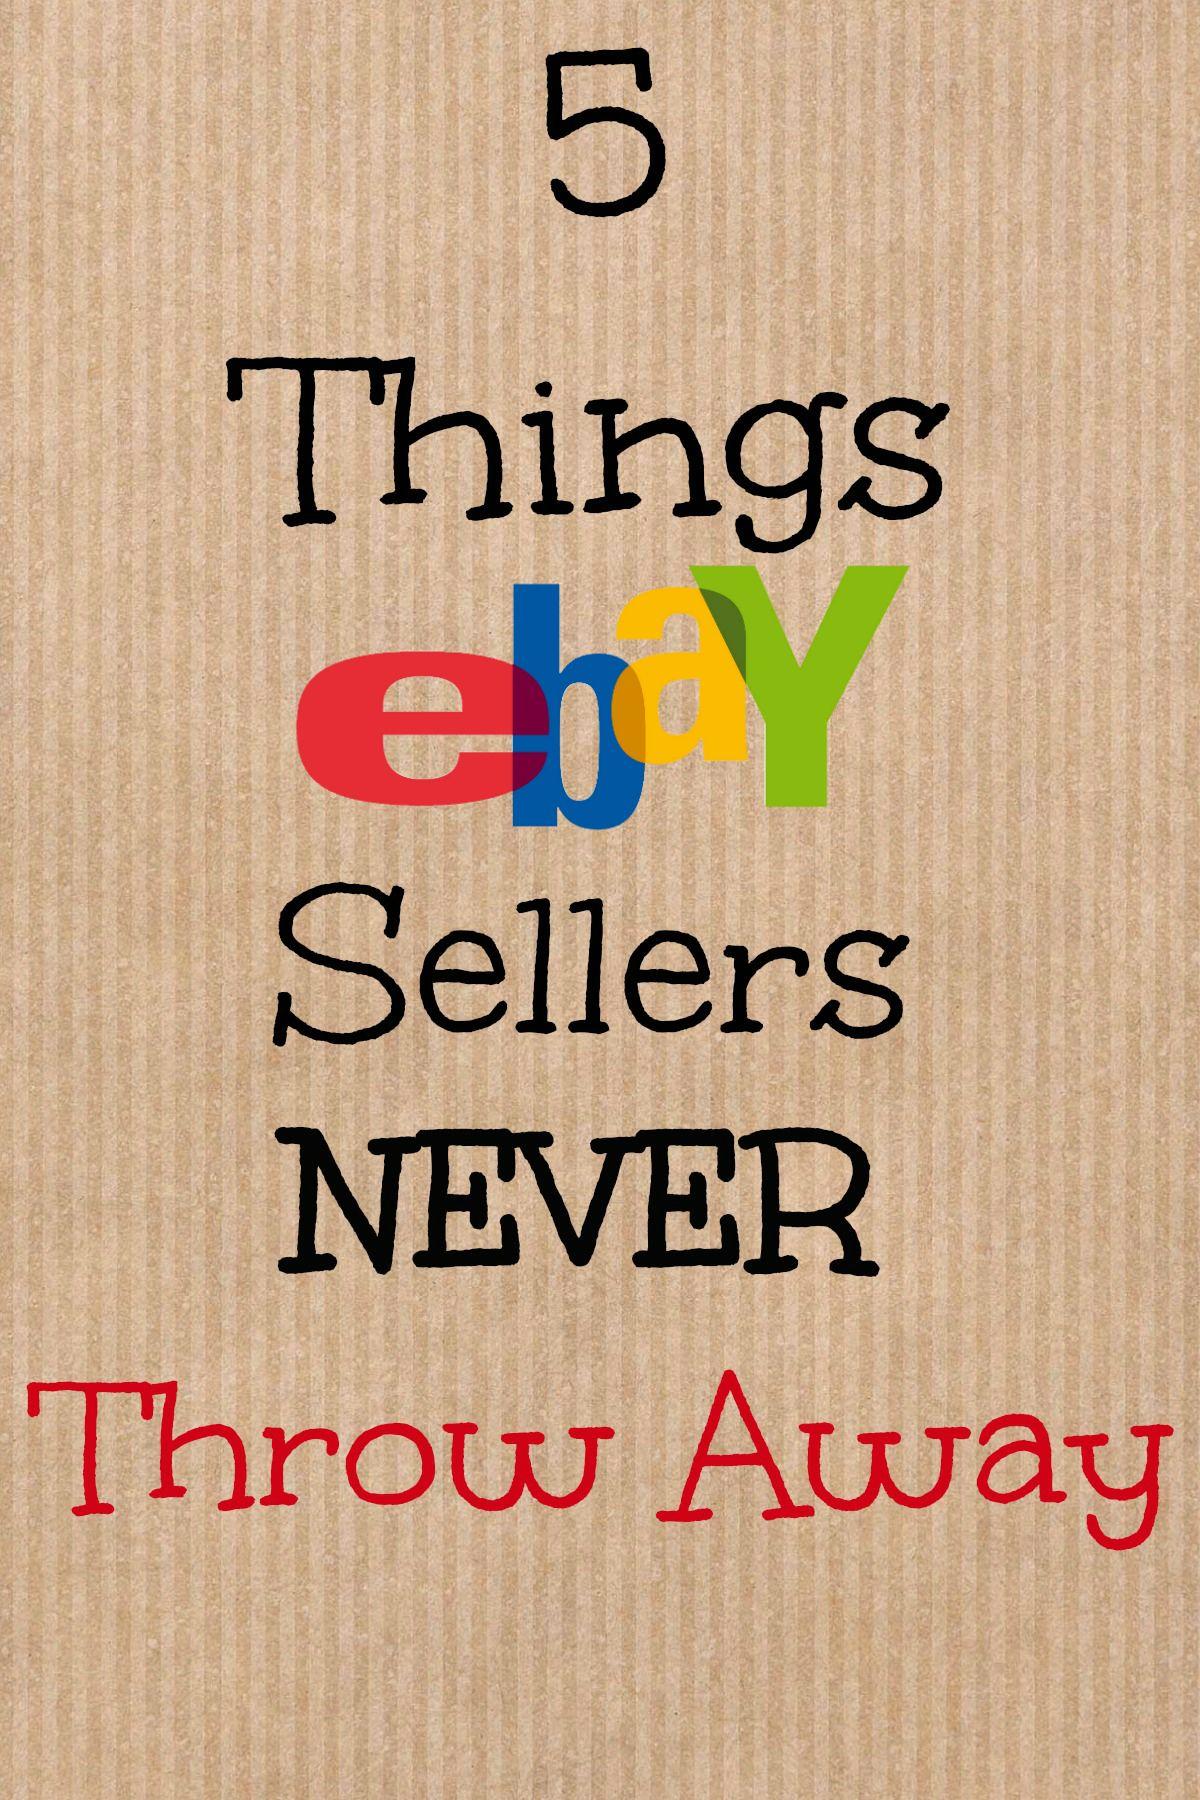 5 Things Ebay Sellers Never Throw Away Ebay Selling Tips Ebay Hacks Ebay Business